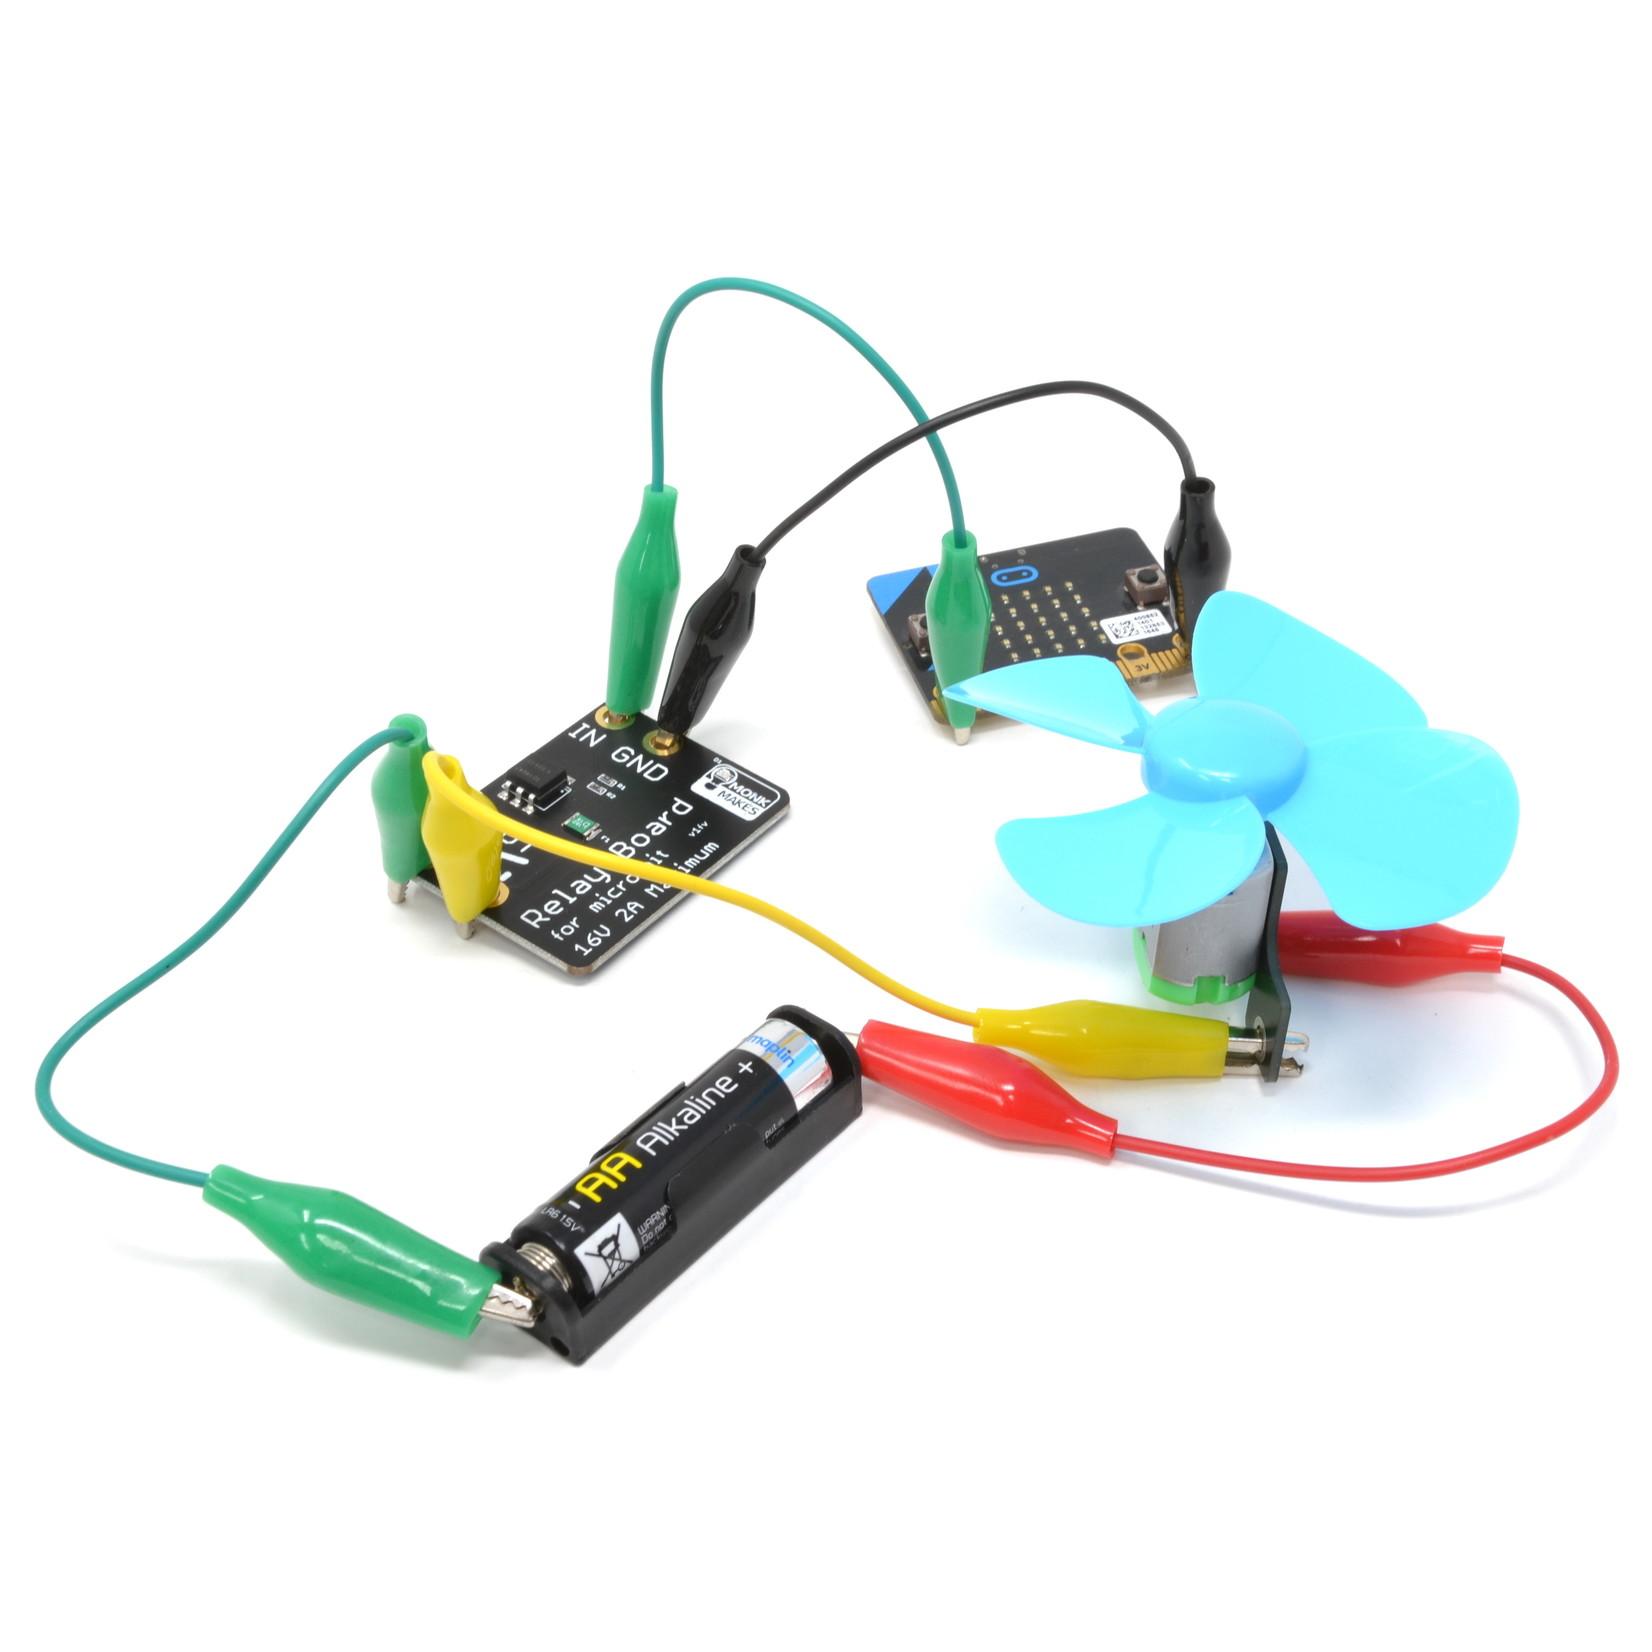 MonkMakes Electronic Starter Kit for micro:bit